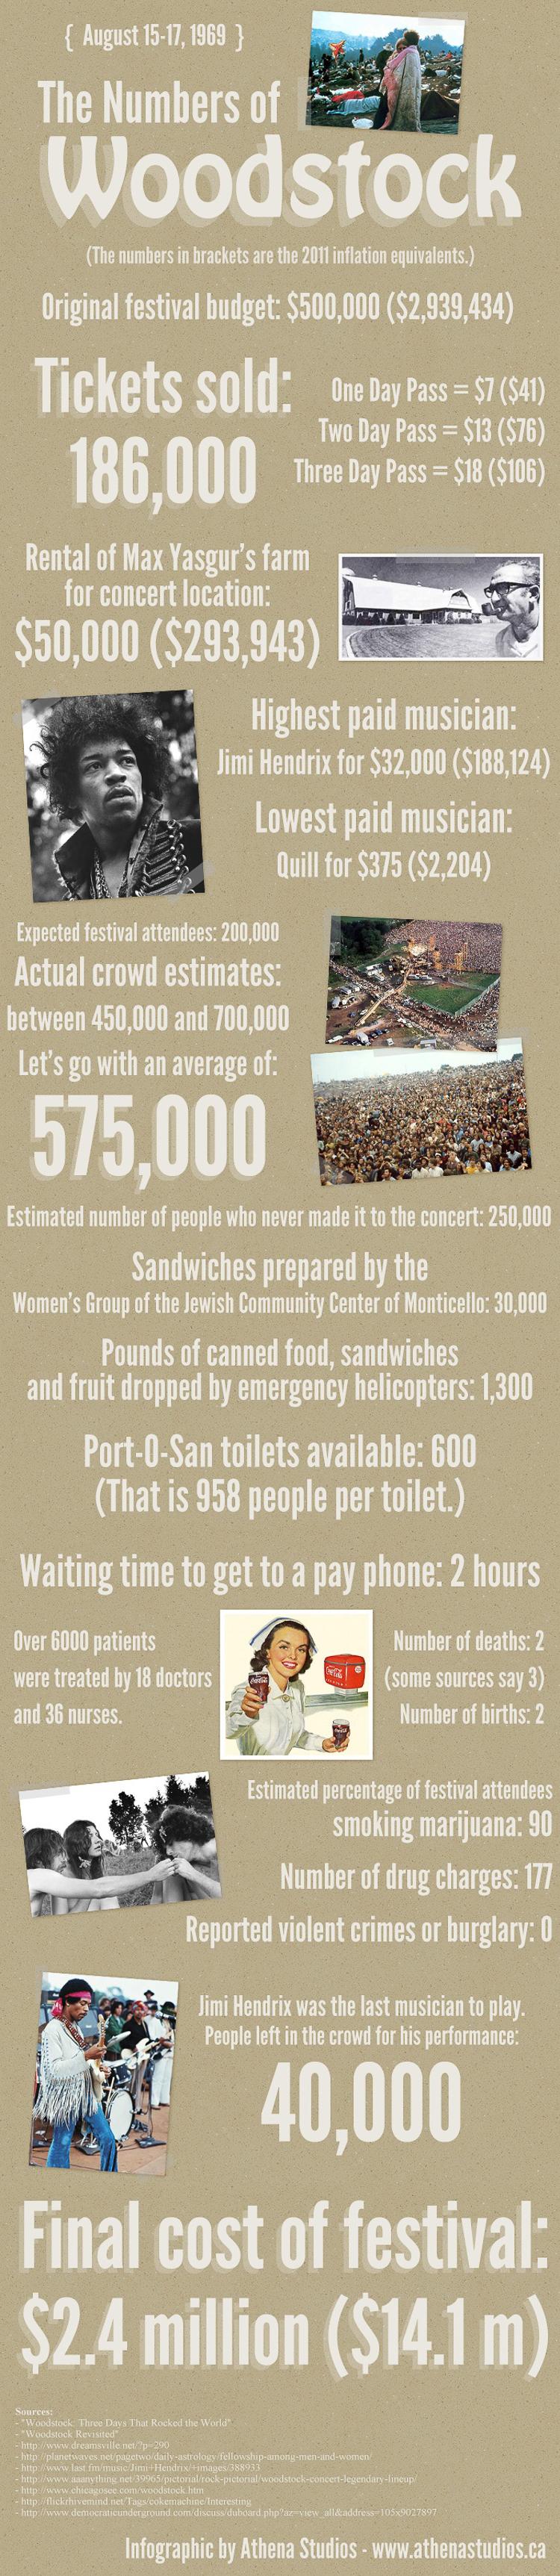 2_Woodstock Stats